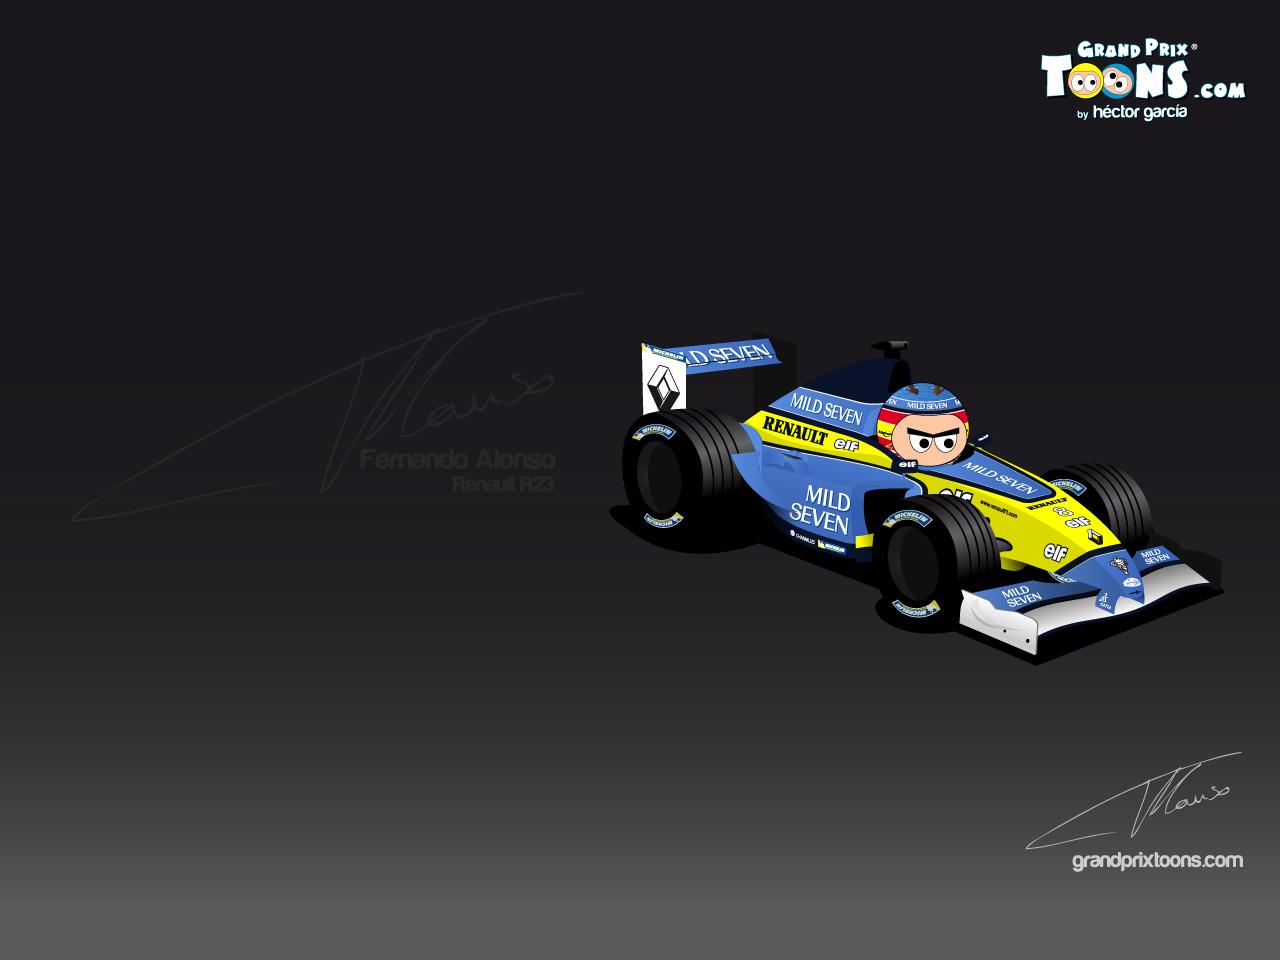 Fernando Alonso Renault R23 gptoons grandprixtoons F1 wallpaper 1280x960